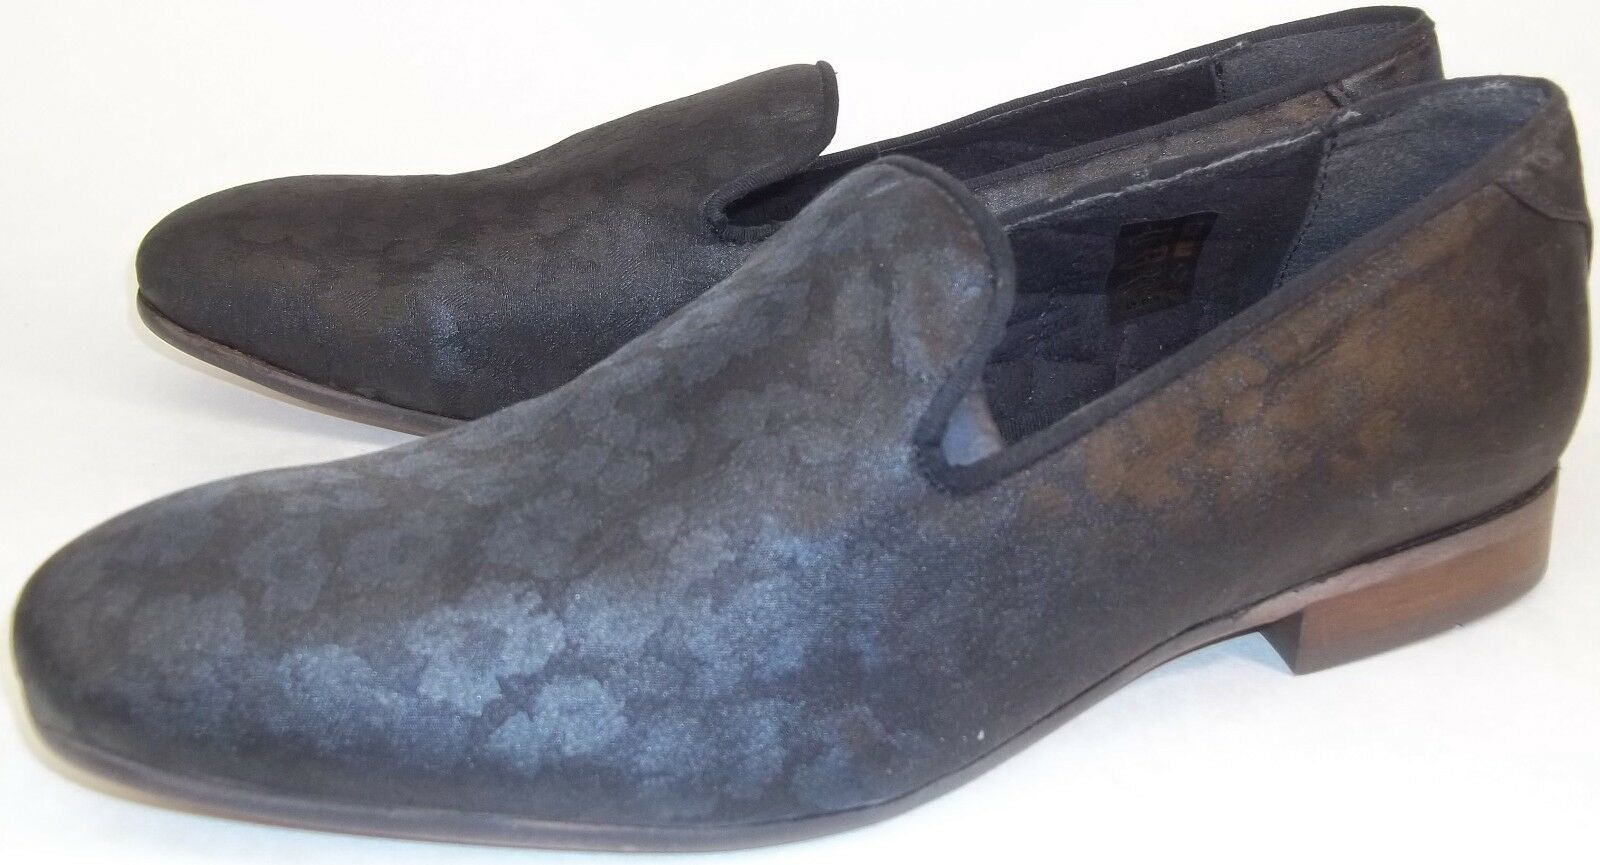 Scarpe casual da uomo  H by Hudson uomos Shoes Loafers EU43 US10 Rowan Casual Designer Smoking Slippers